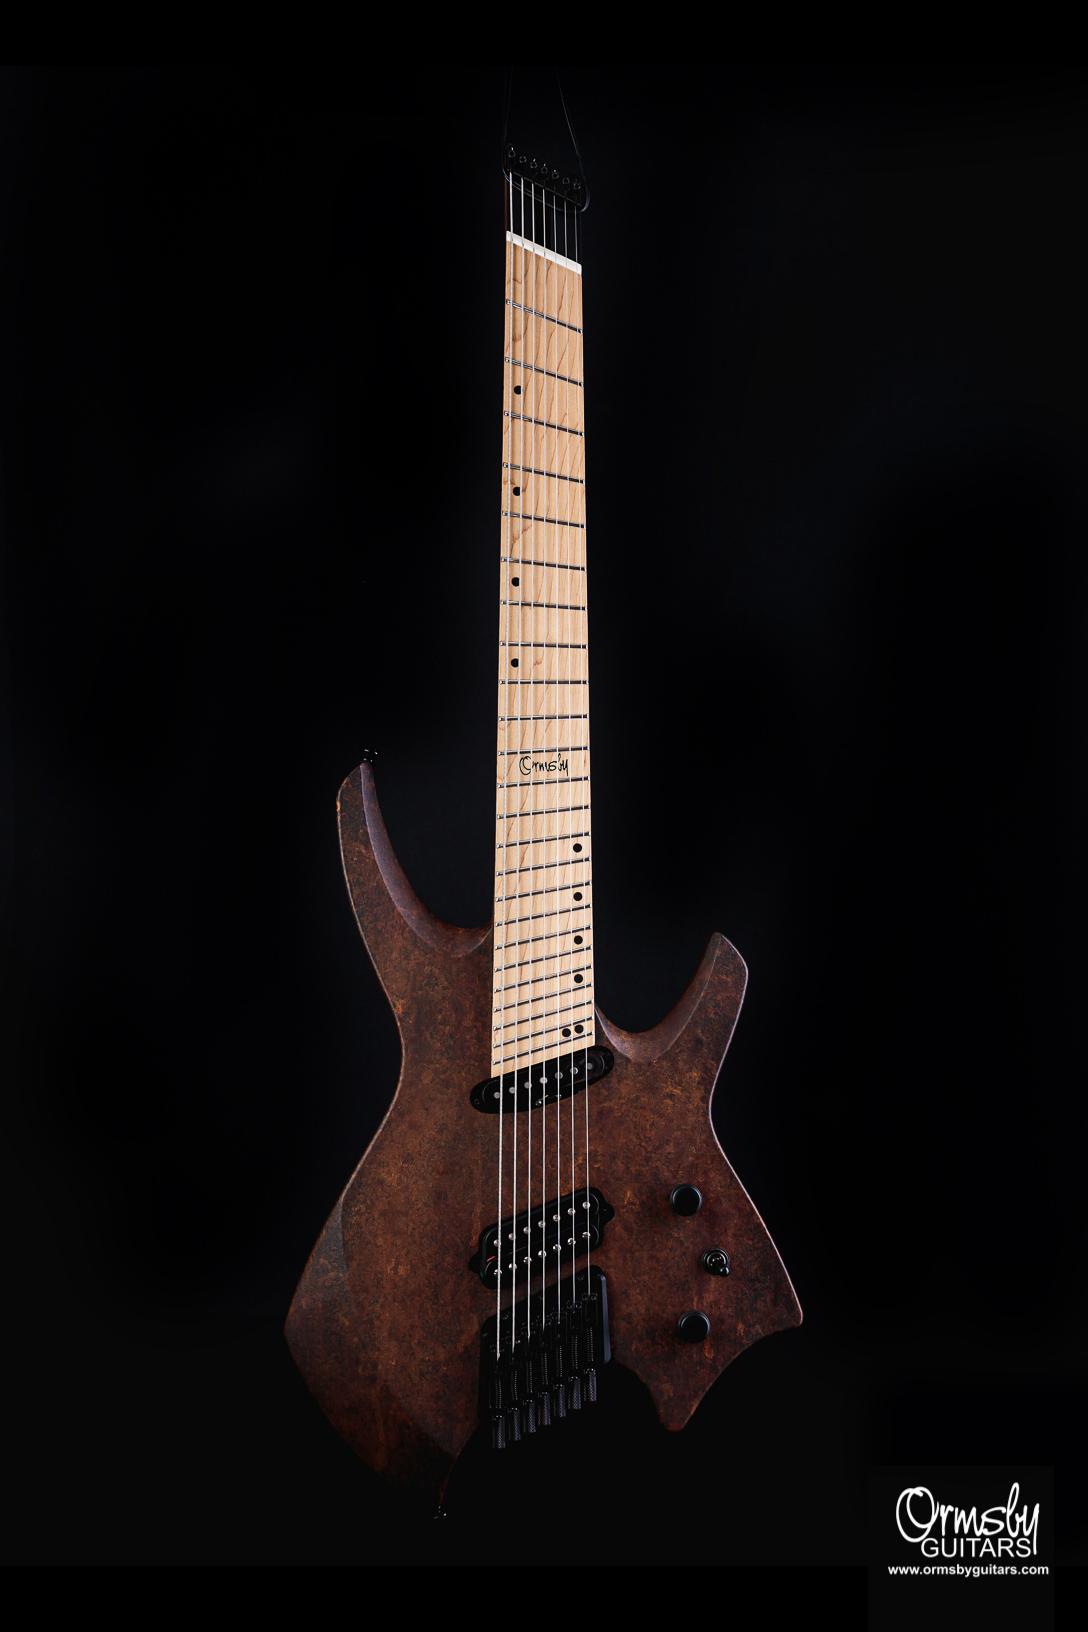 Ormsby Guitars rust headless goliath Custom Finish